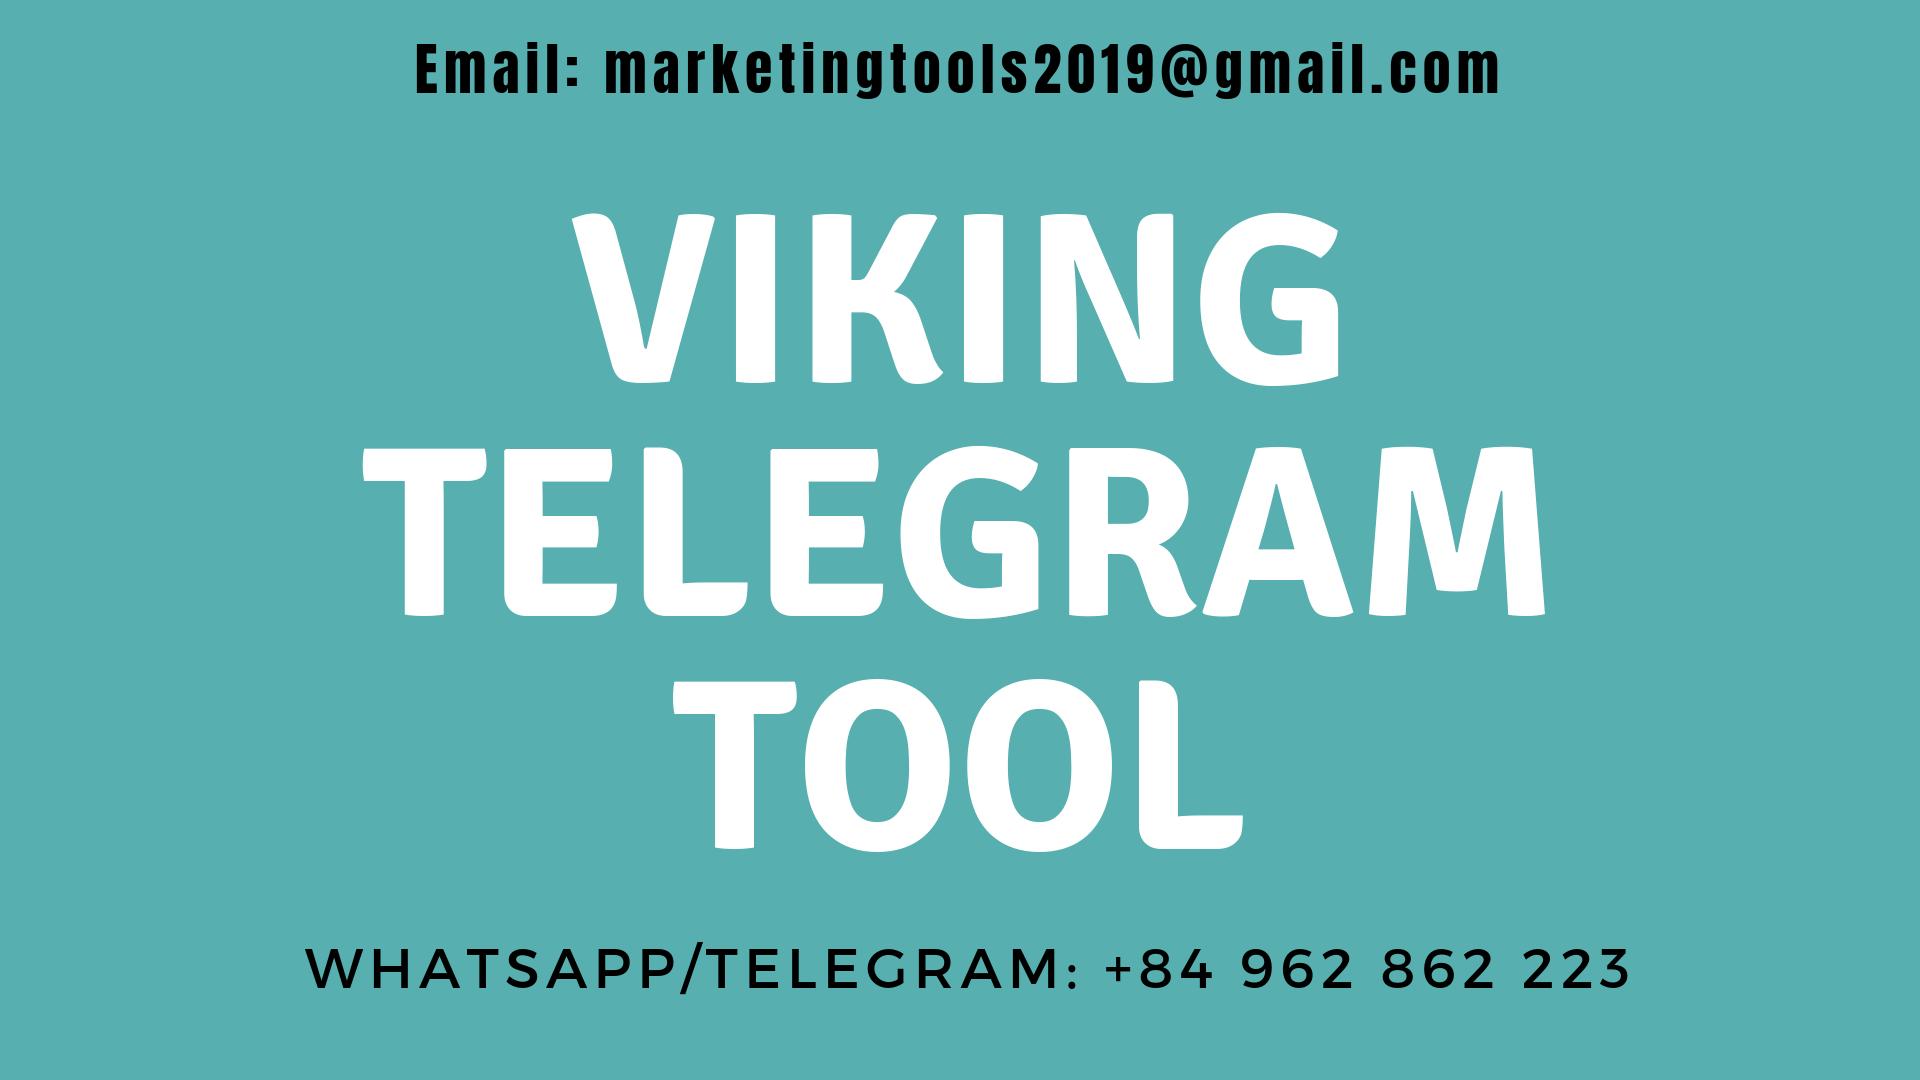 Viking Telegram Tool - Telegram Marketing Software - Viking Telegram